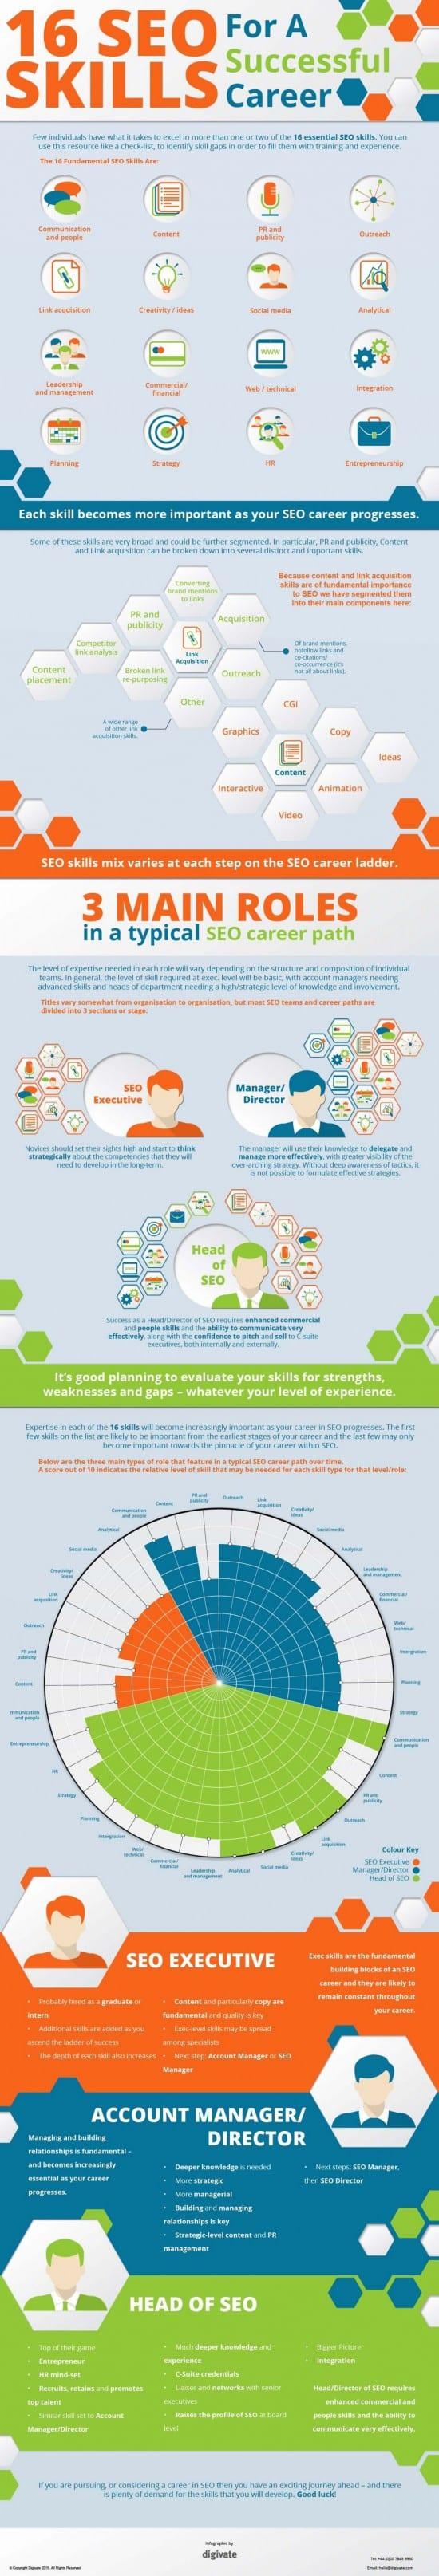 the-16-seo-skills-for-career-success